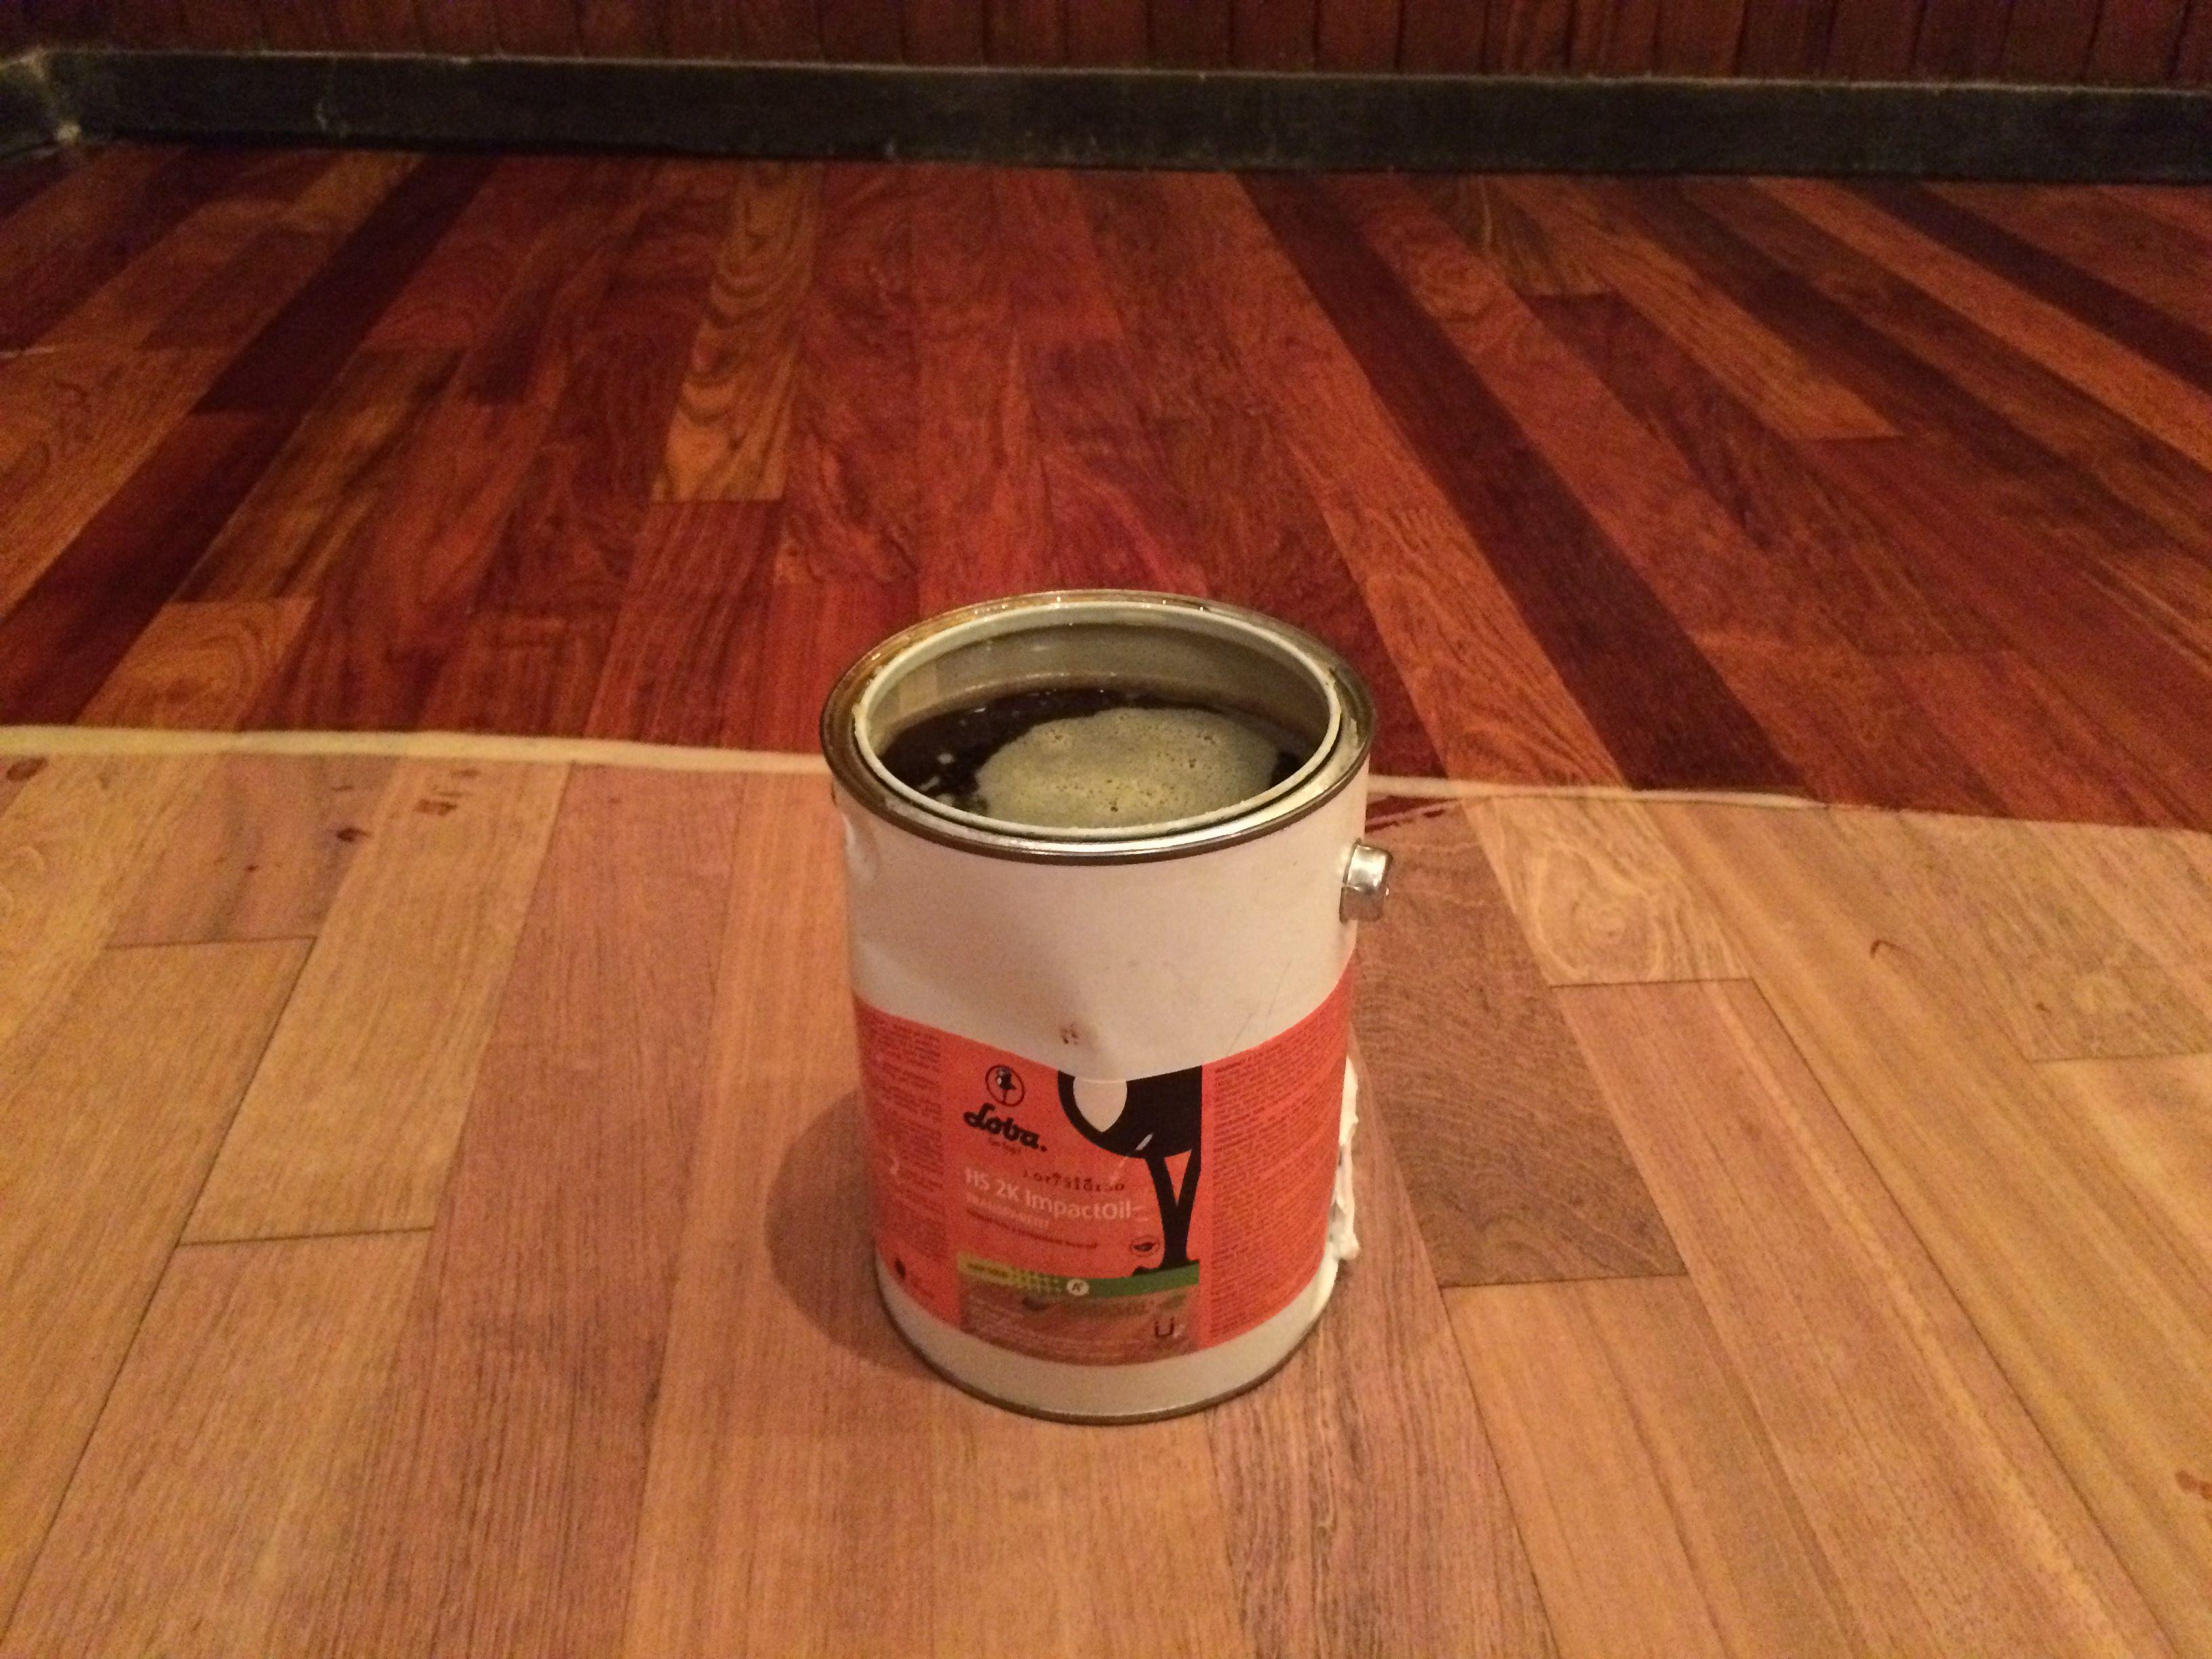 Loba 2k Impact Oil 1 Coat Hardwood Floor Finishing System